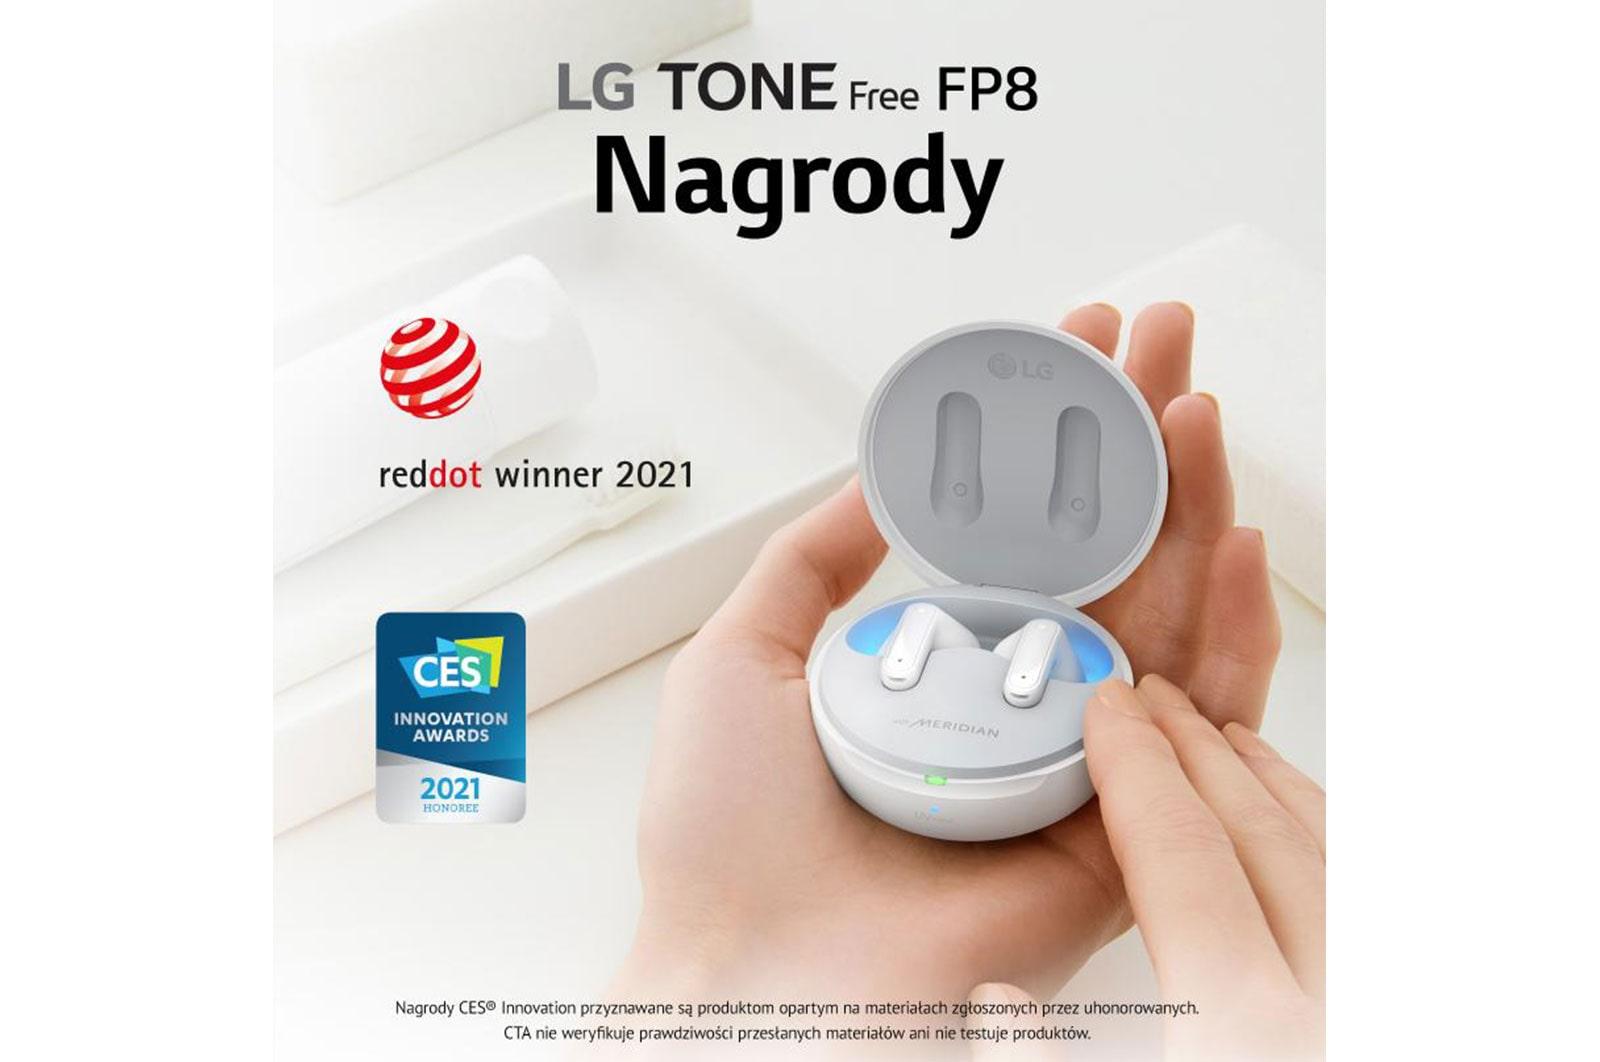 LG TONE Free FP8